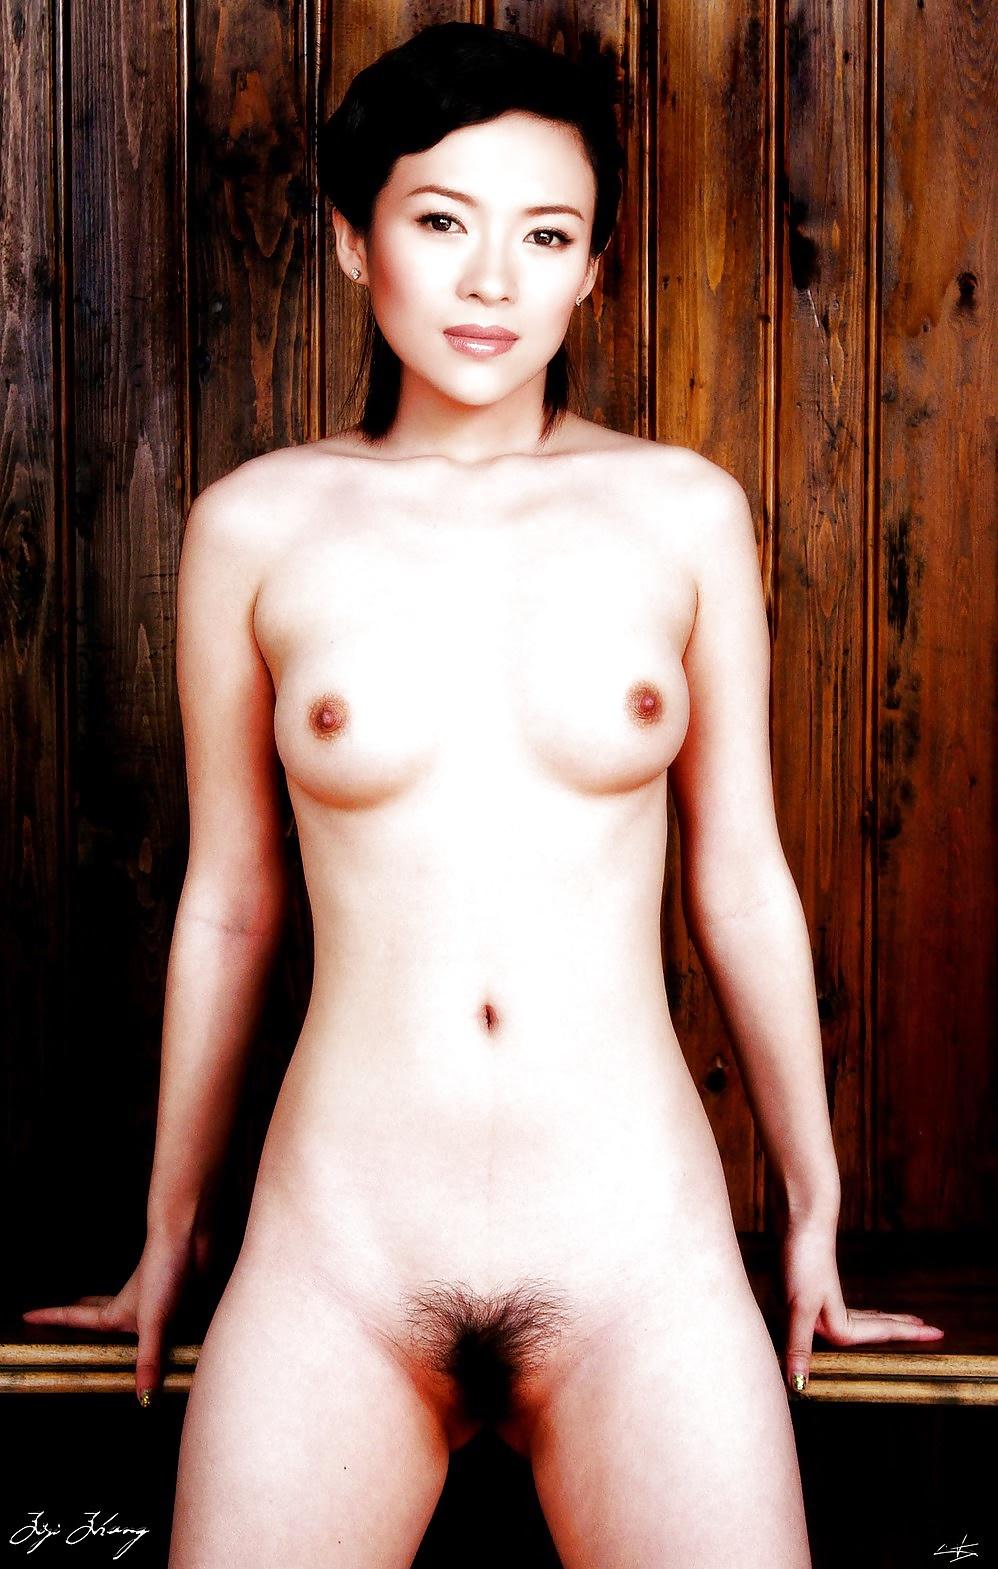 Nudes Tgp 62